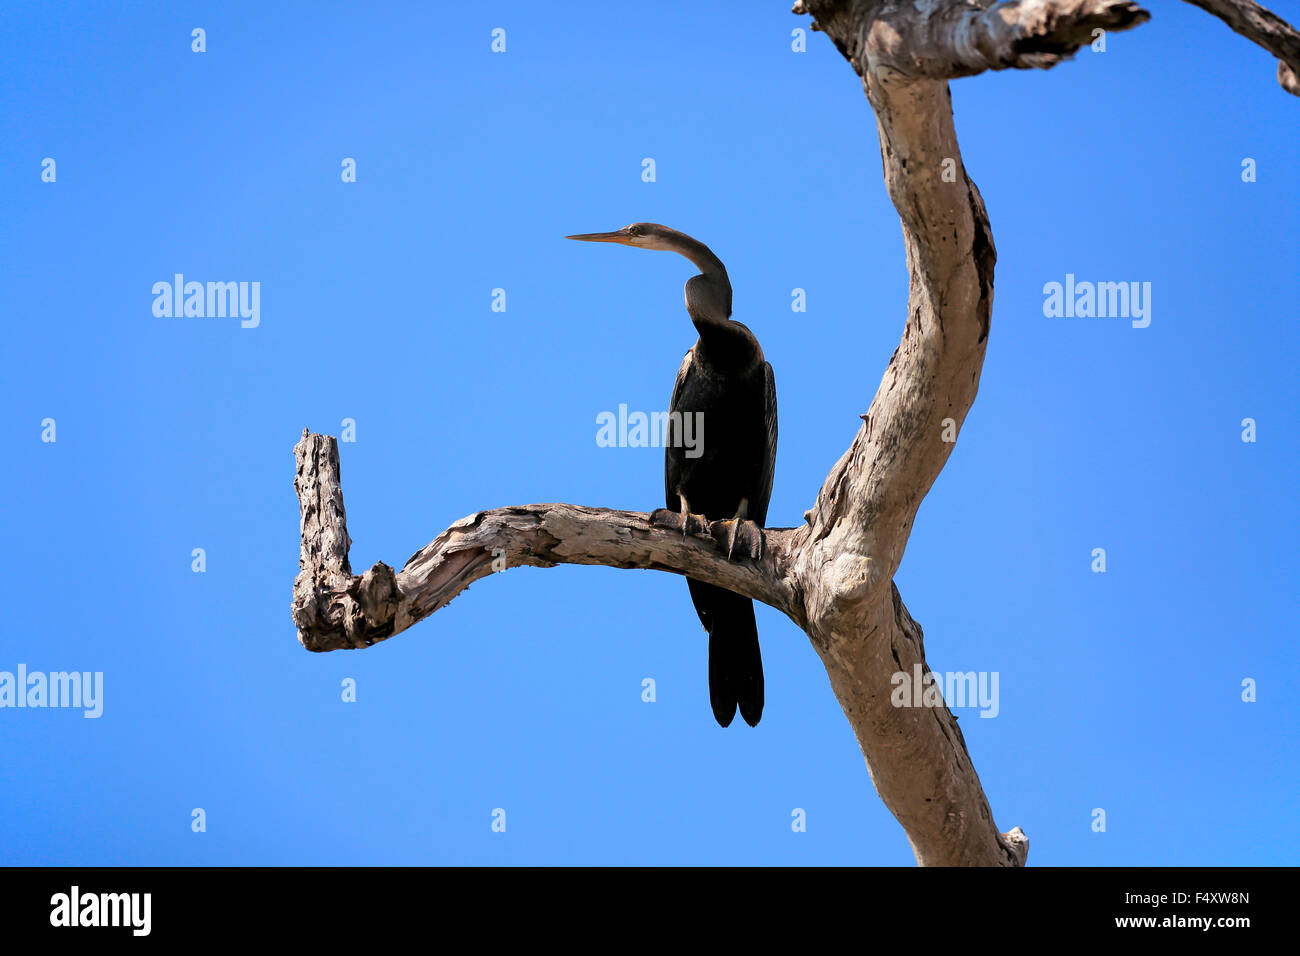 Oriental darter (Anhinga melanogaster), adult, on the lookout, Bundala National Park, Sri Lanka - Stock Image